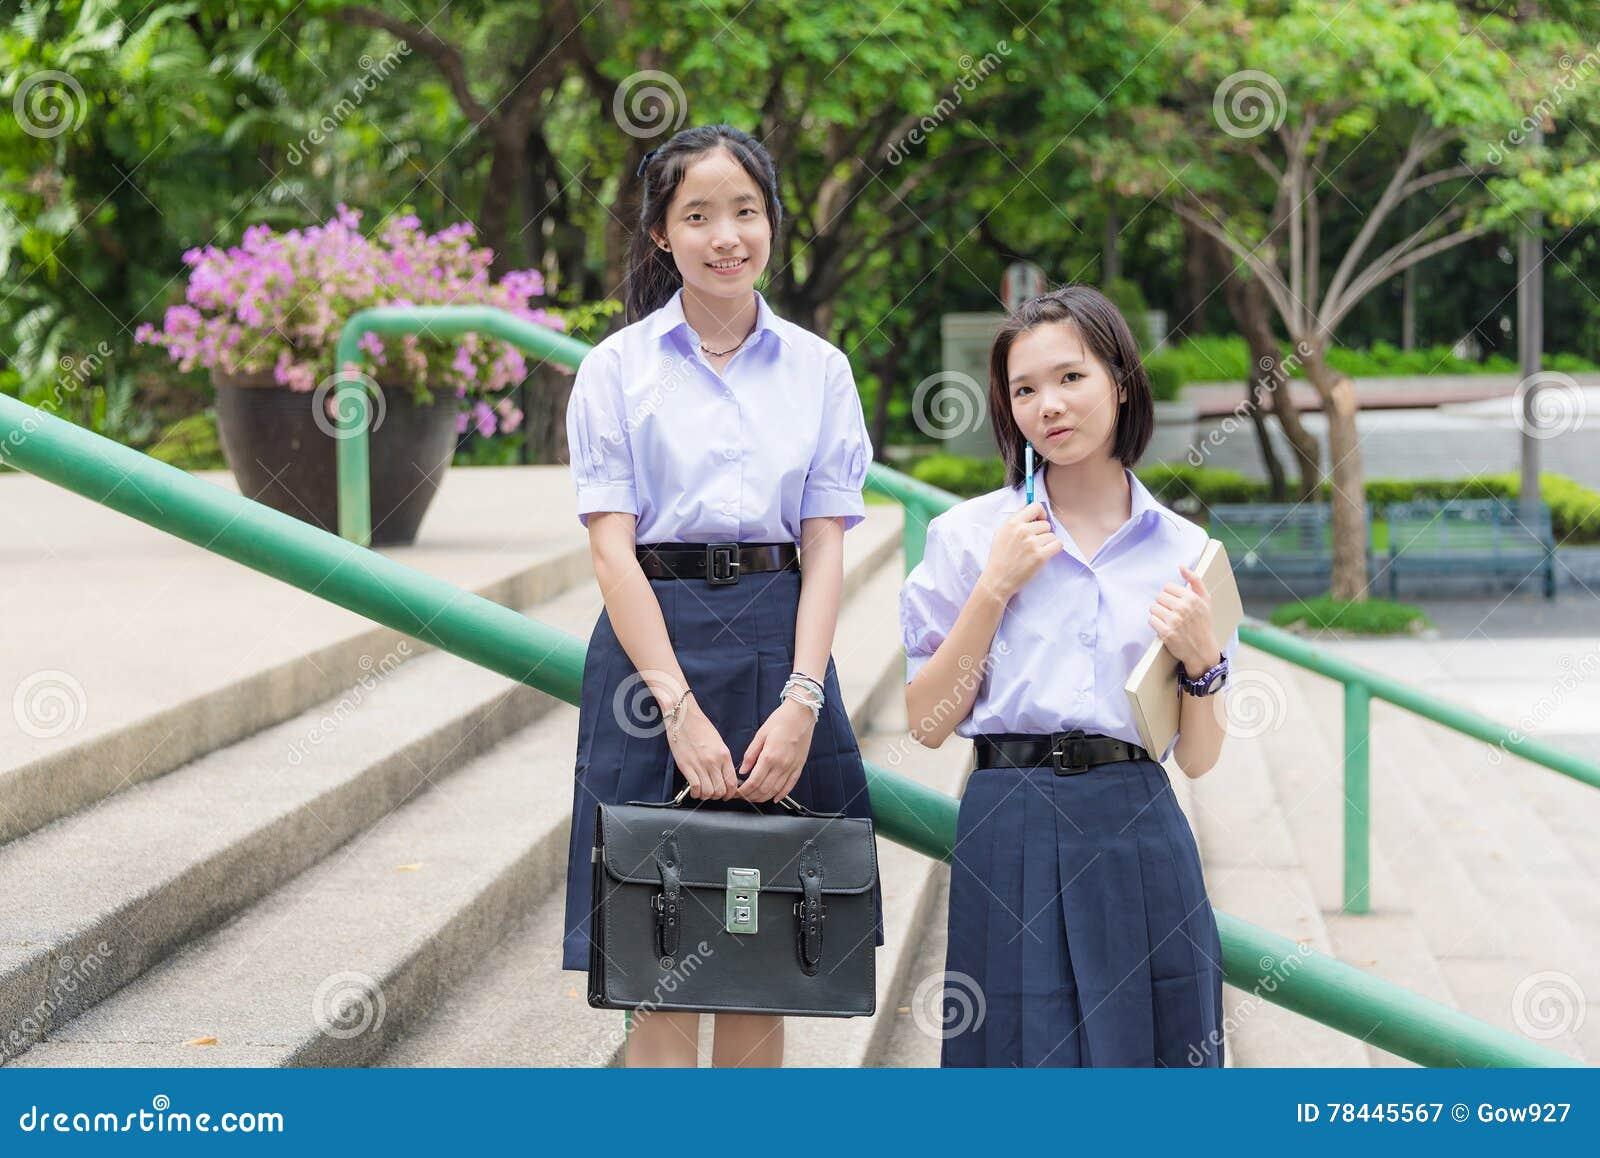 Cute Asian Thai high schoolgirls student couple in school uniform